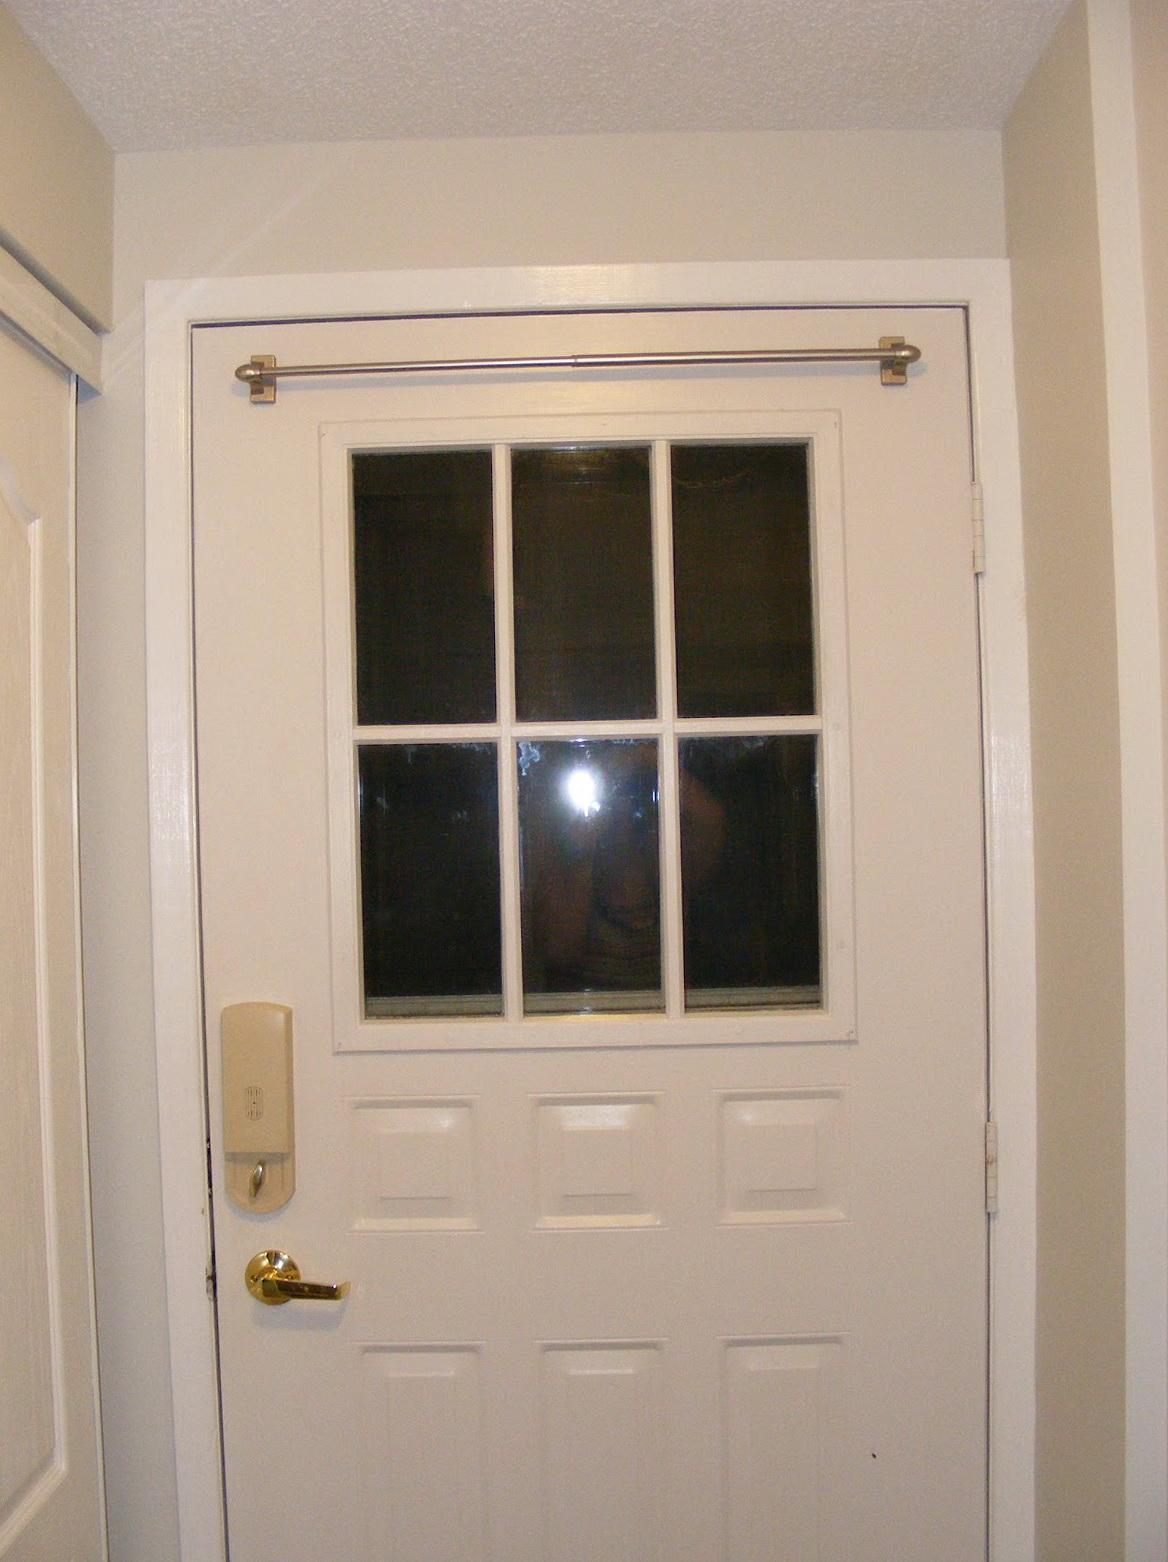 Over The Door Curtain Rod Home Design Ideas